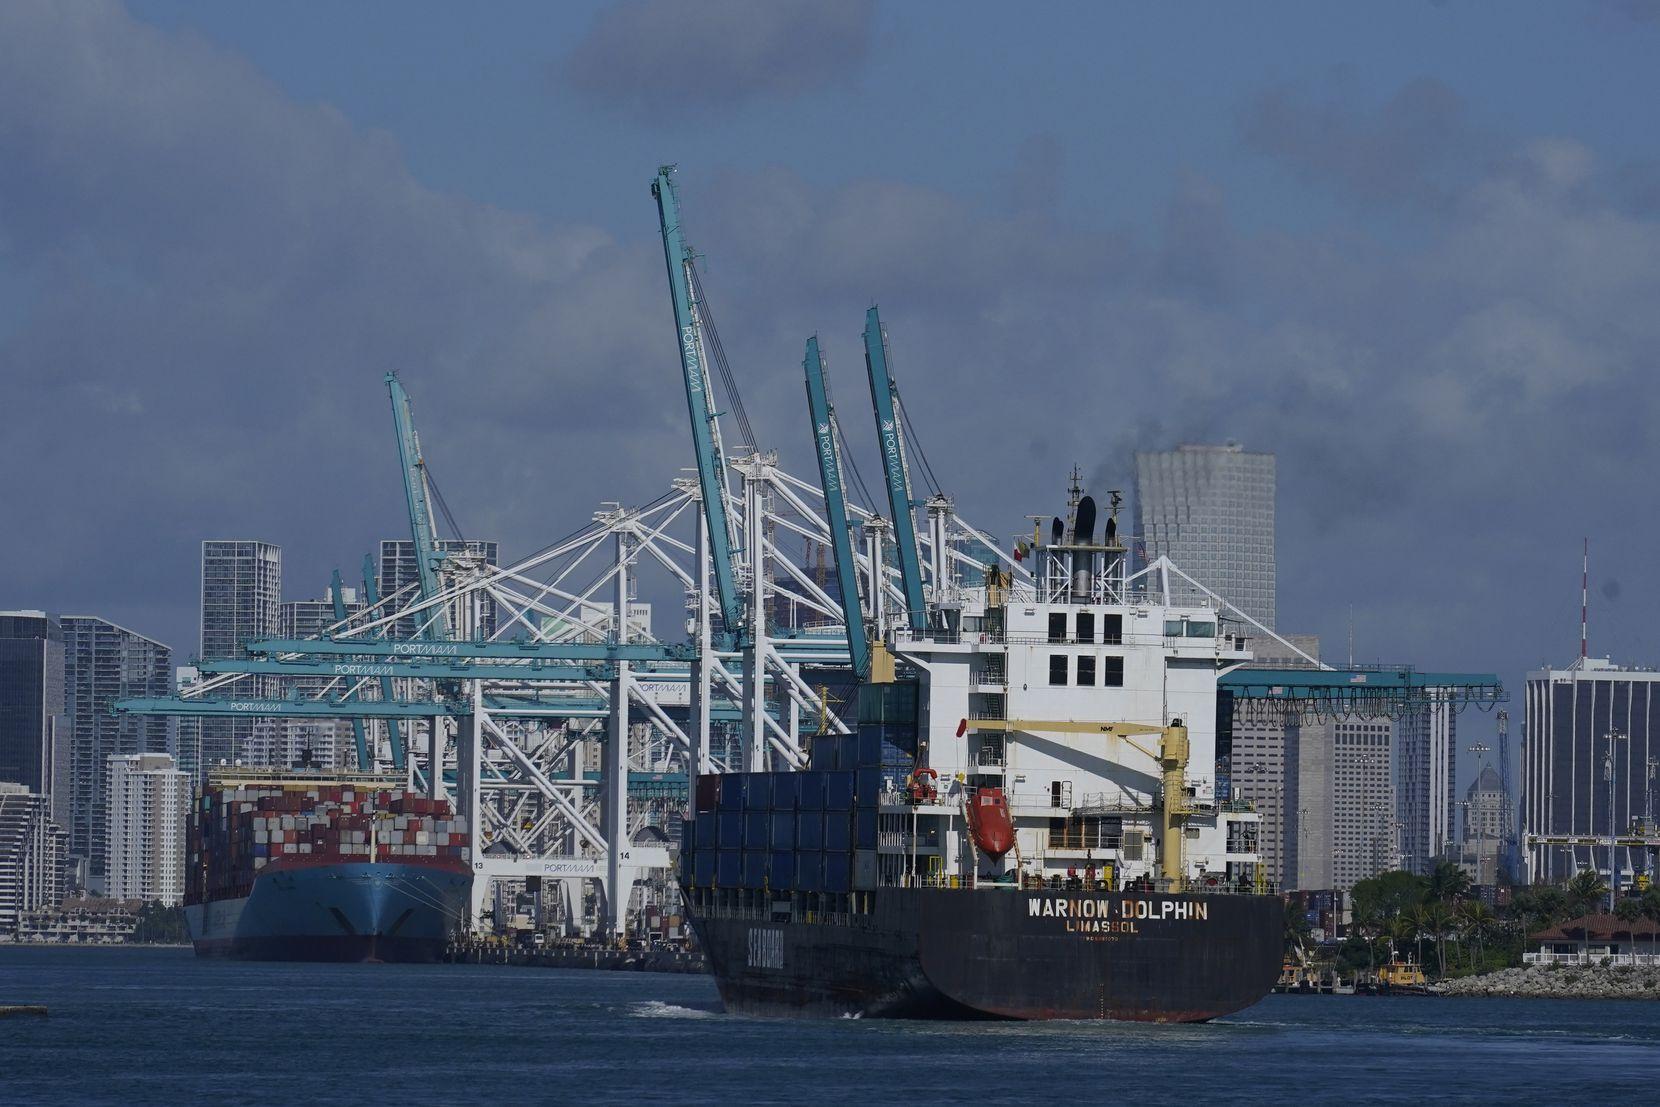 In this April 29 photo, the Warnow-Dolphin container ship enters Port Miami in Miami Beach, Fla.